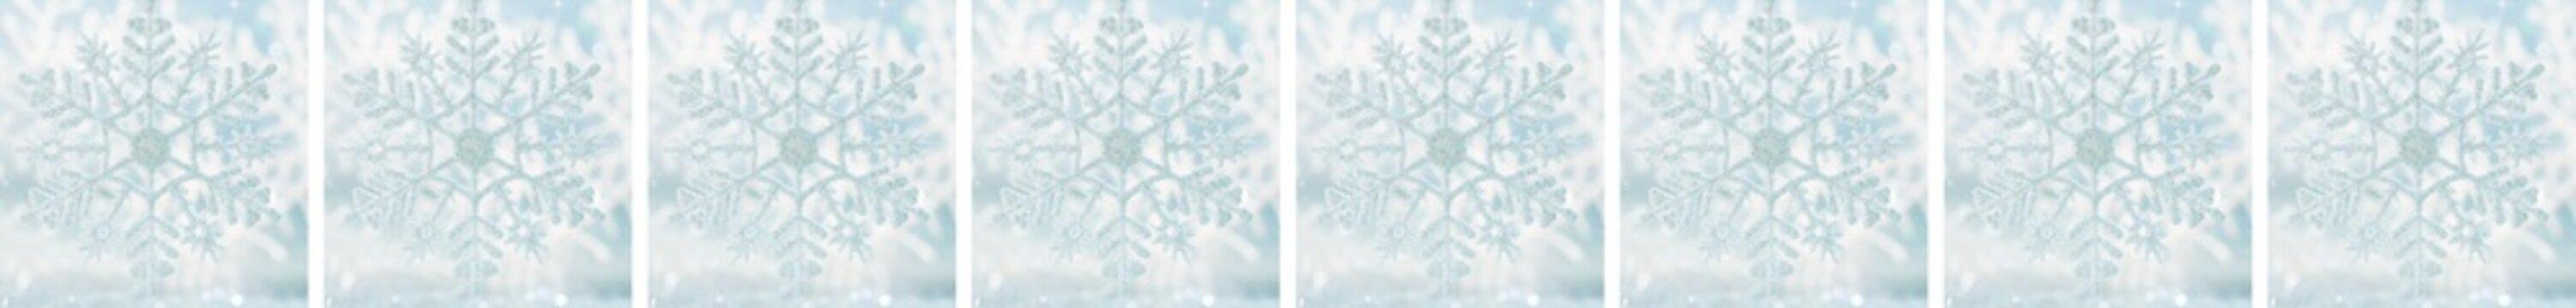 Border snowflake on a blue festive background. Beautiful Christmas background